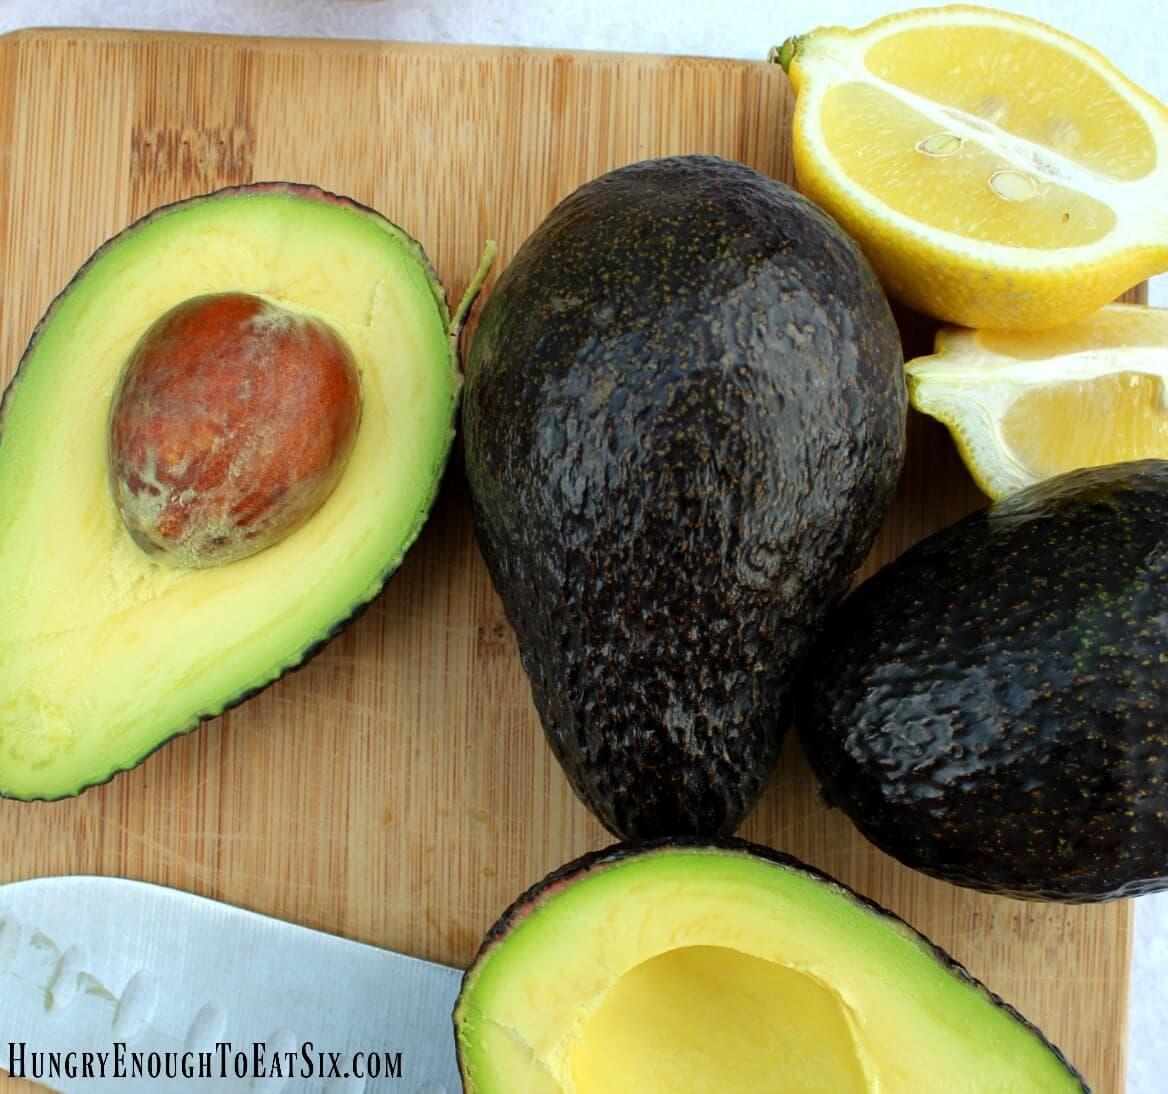 Image of sliced avocado and lemon wedges